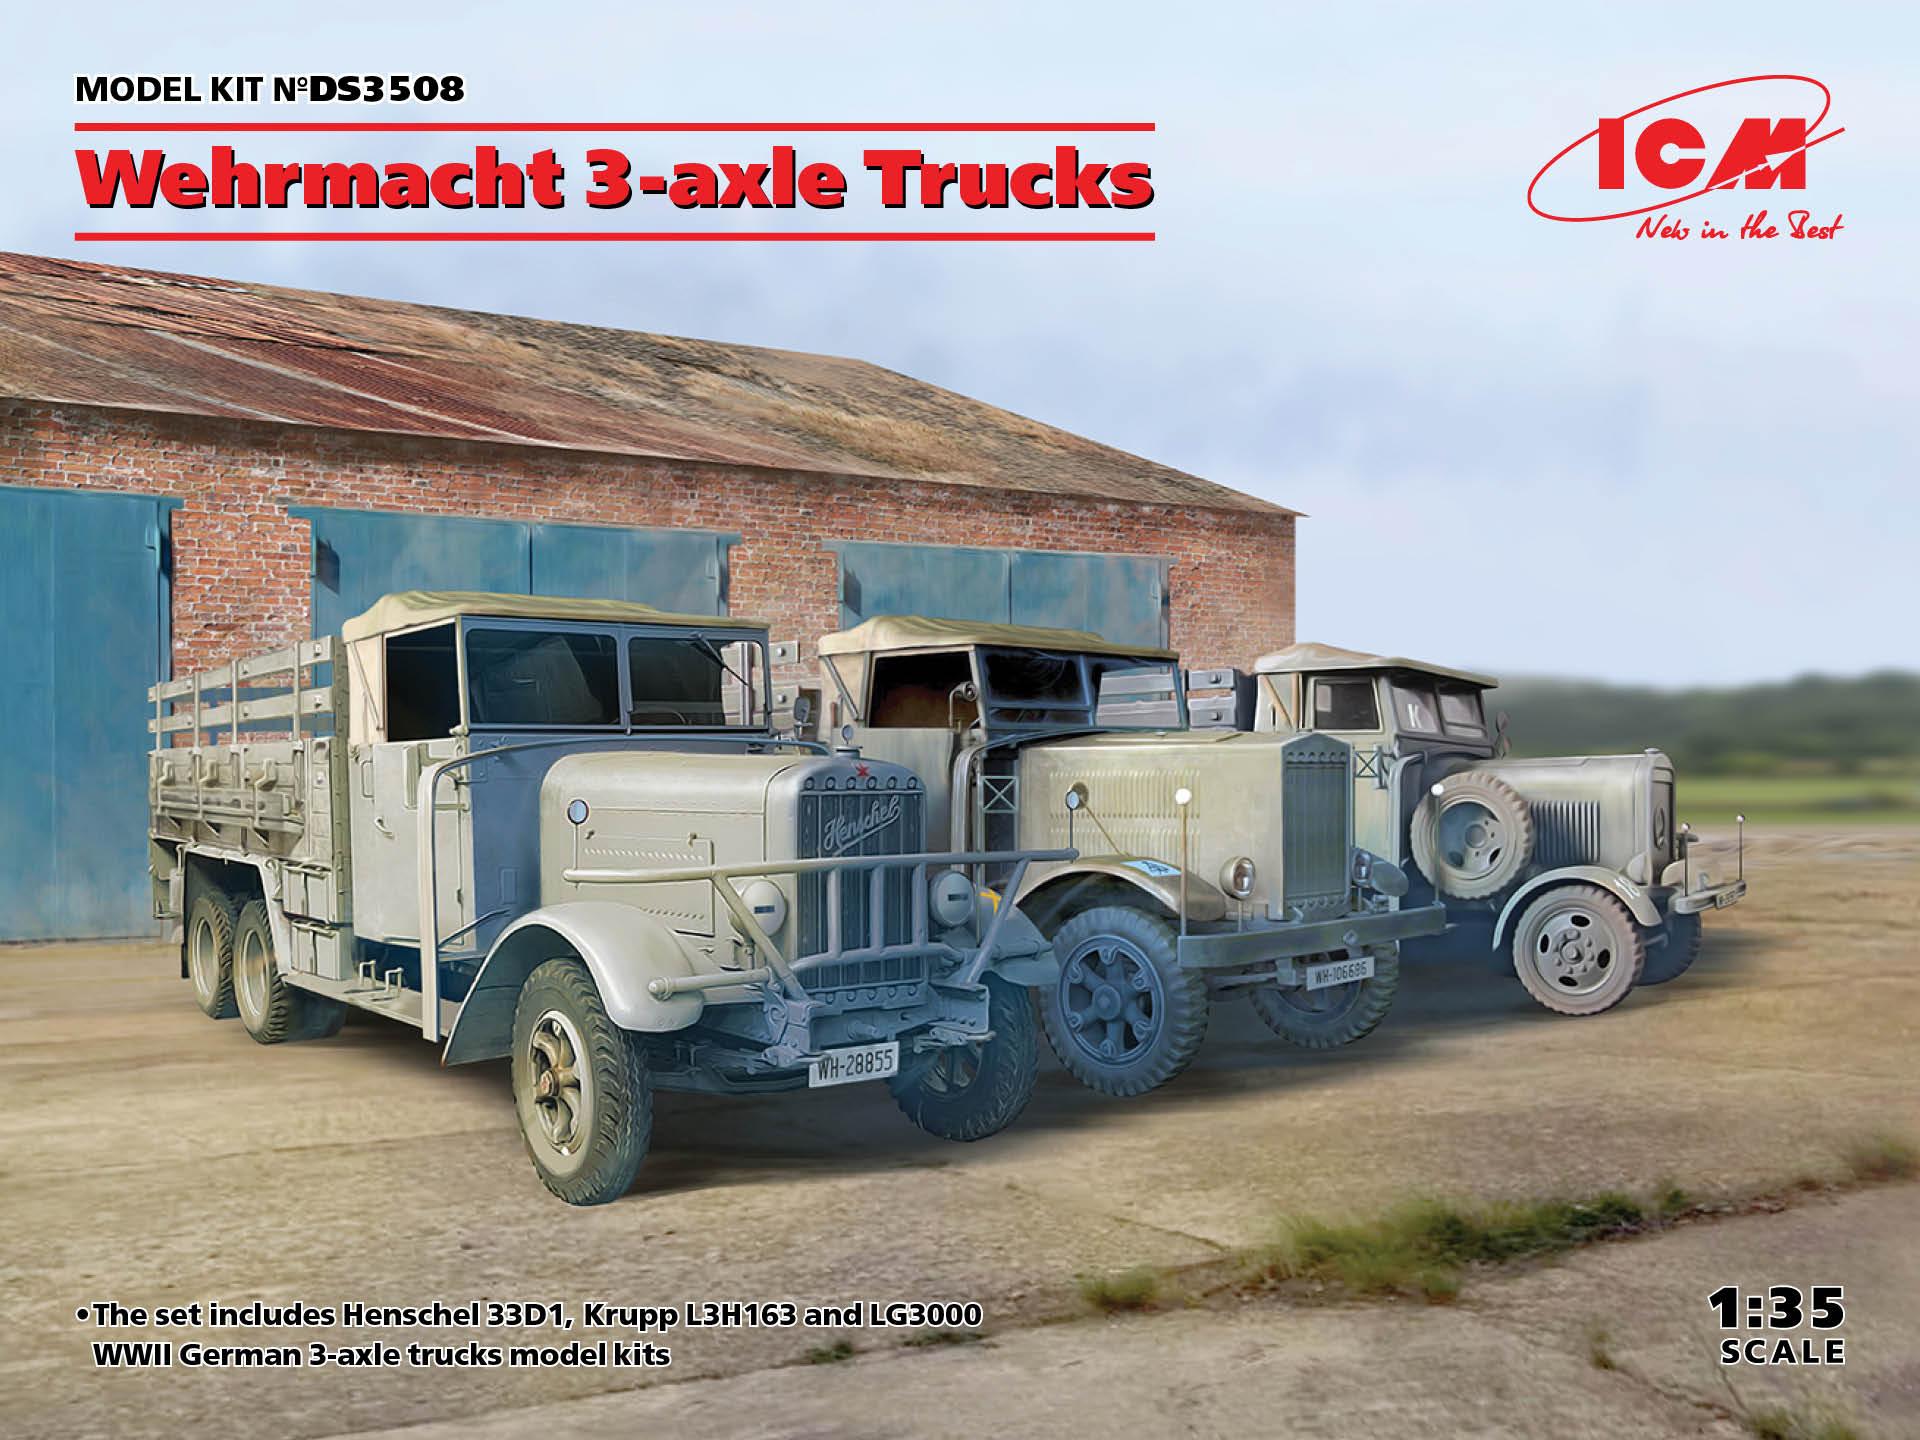 ICM 1/35 Wehrmacht 3-axle Trucks (Henschel 33D1, Krupp L3H163, LG3000)